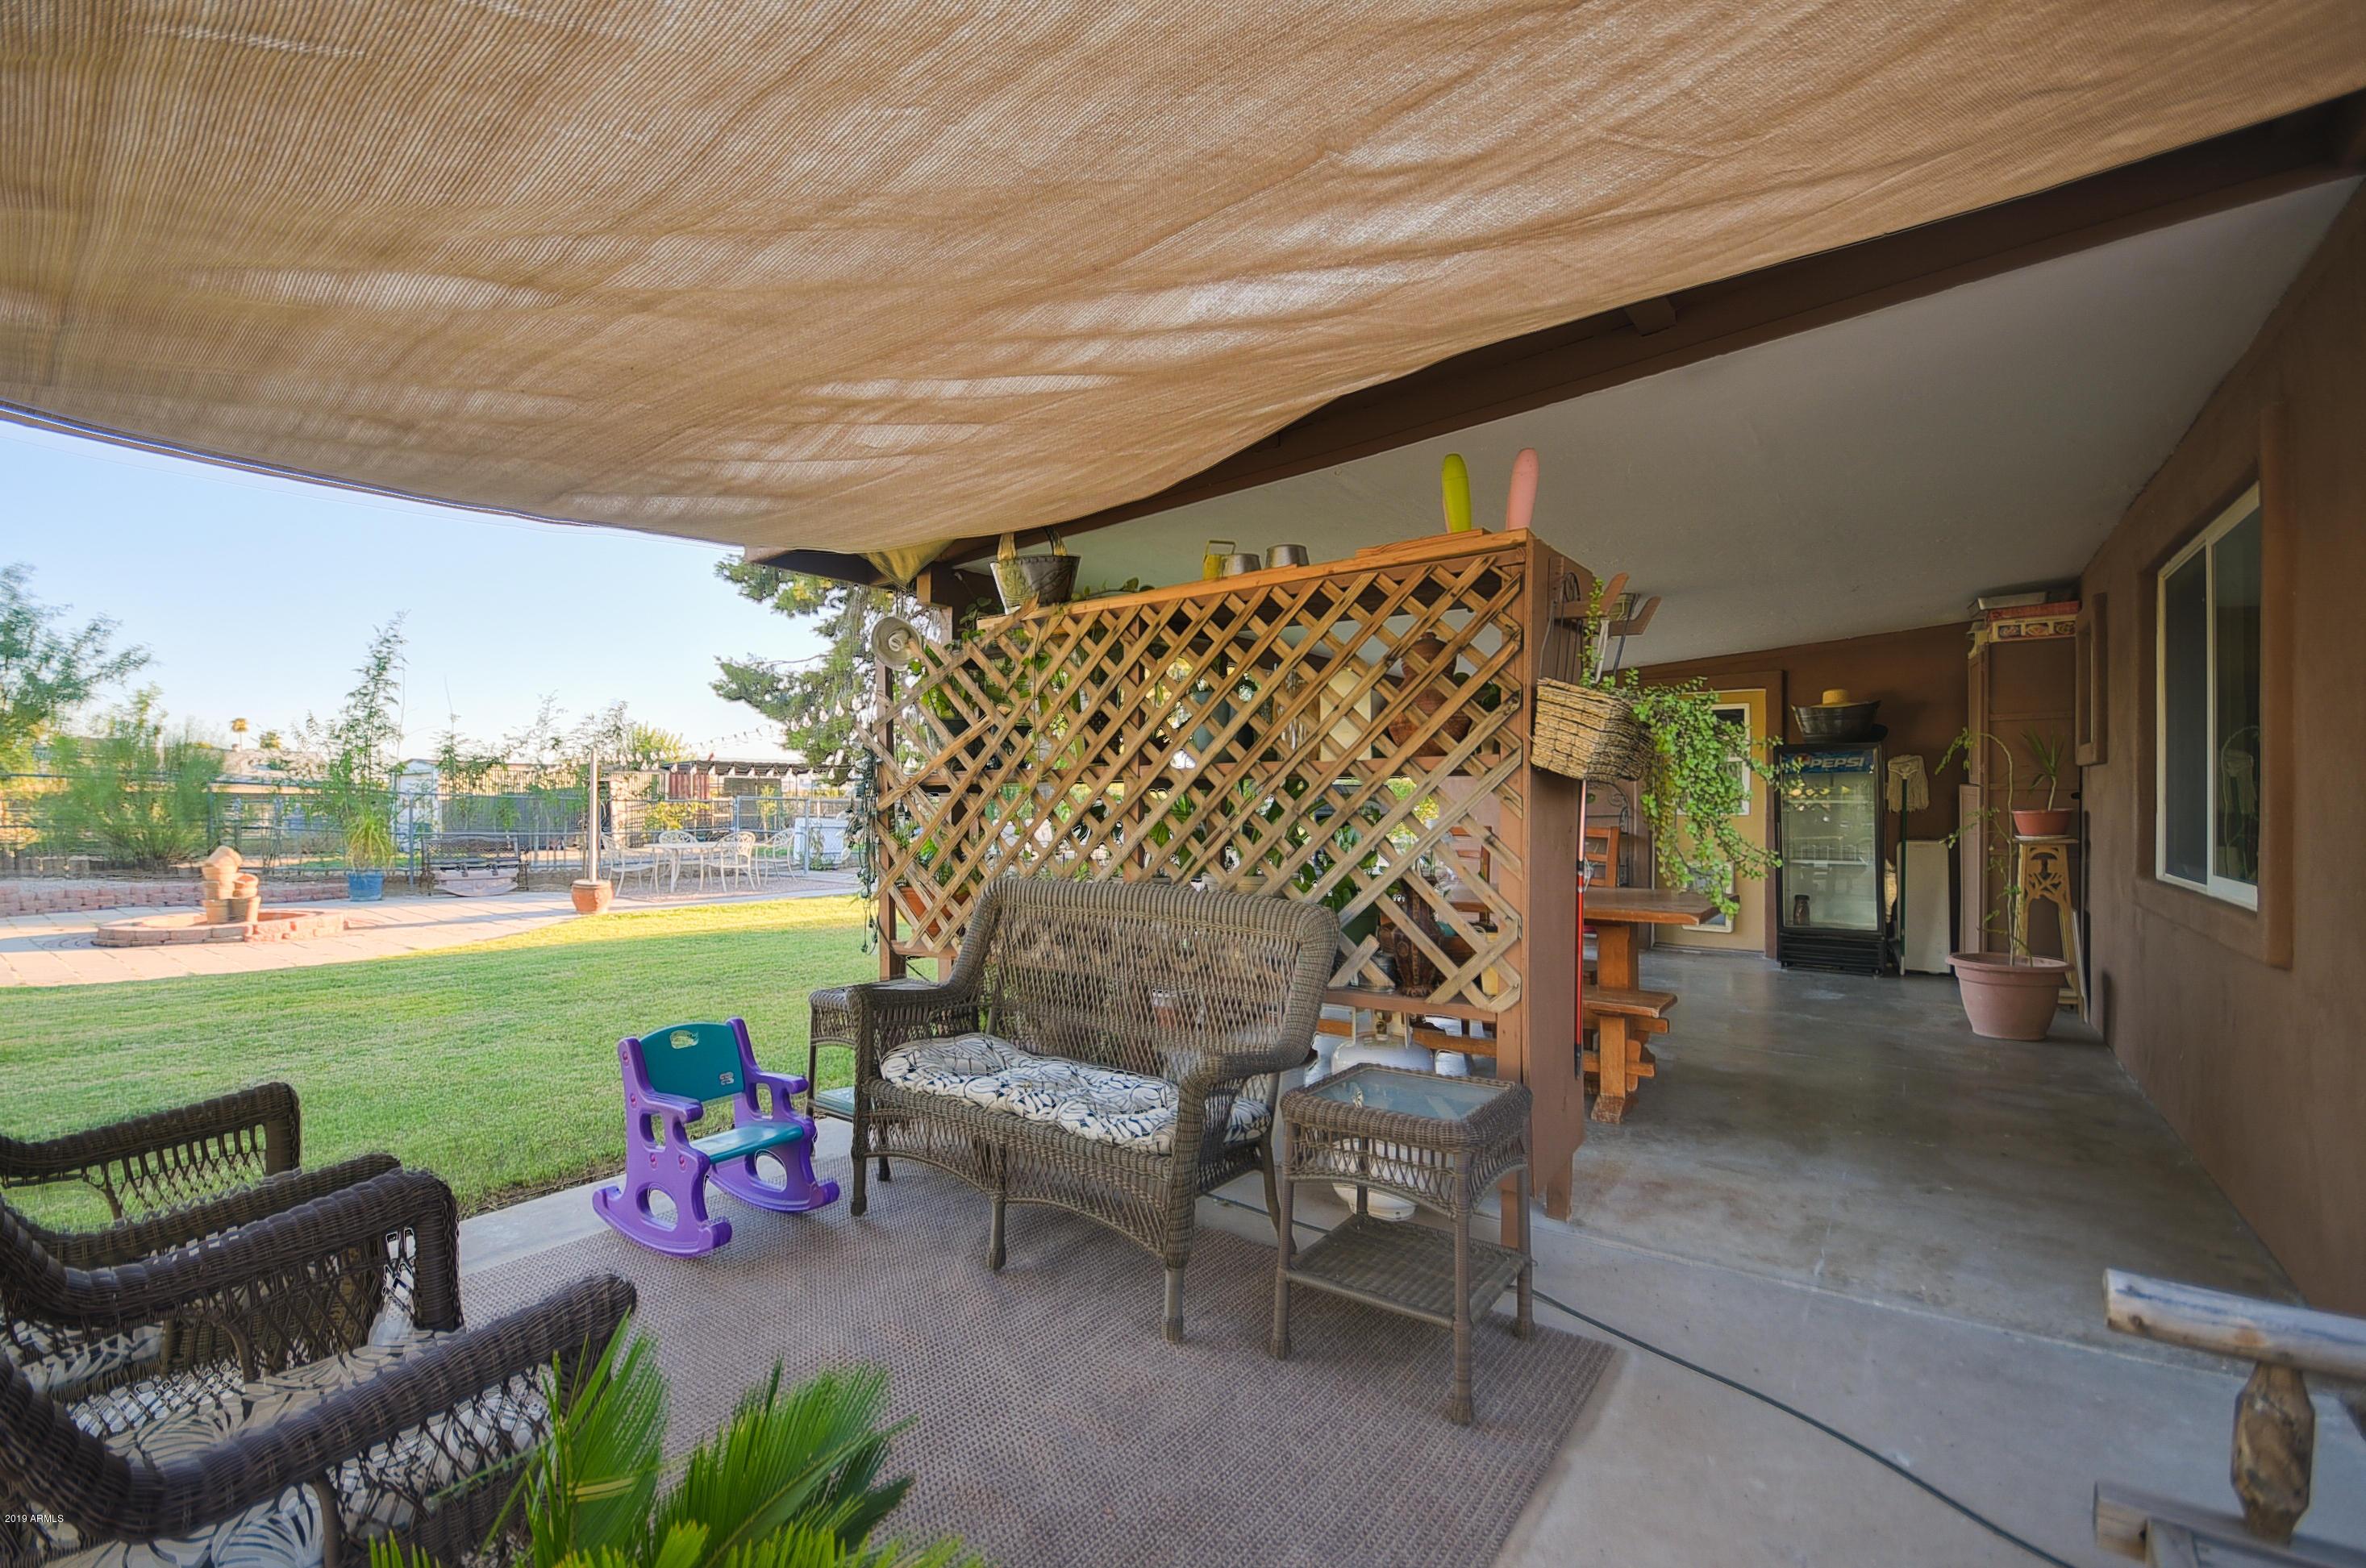 MLS 5968969 6029 W MONTE CRISTO Avenue, Glendale, AZ 85306 Glendale AZ North Glendale